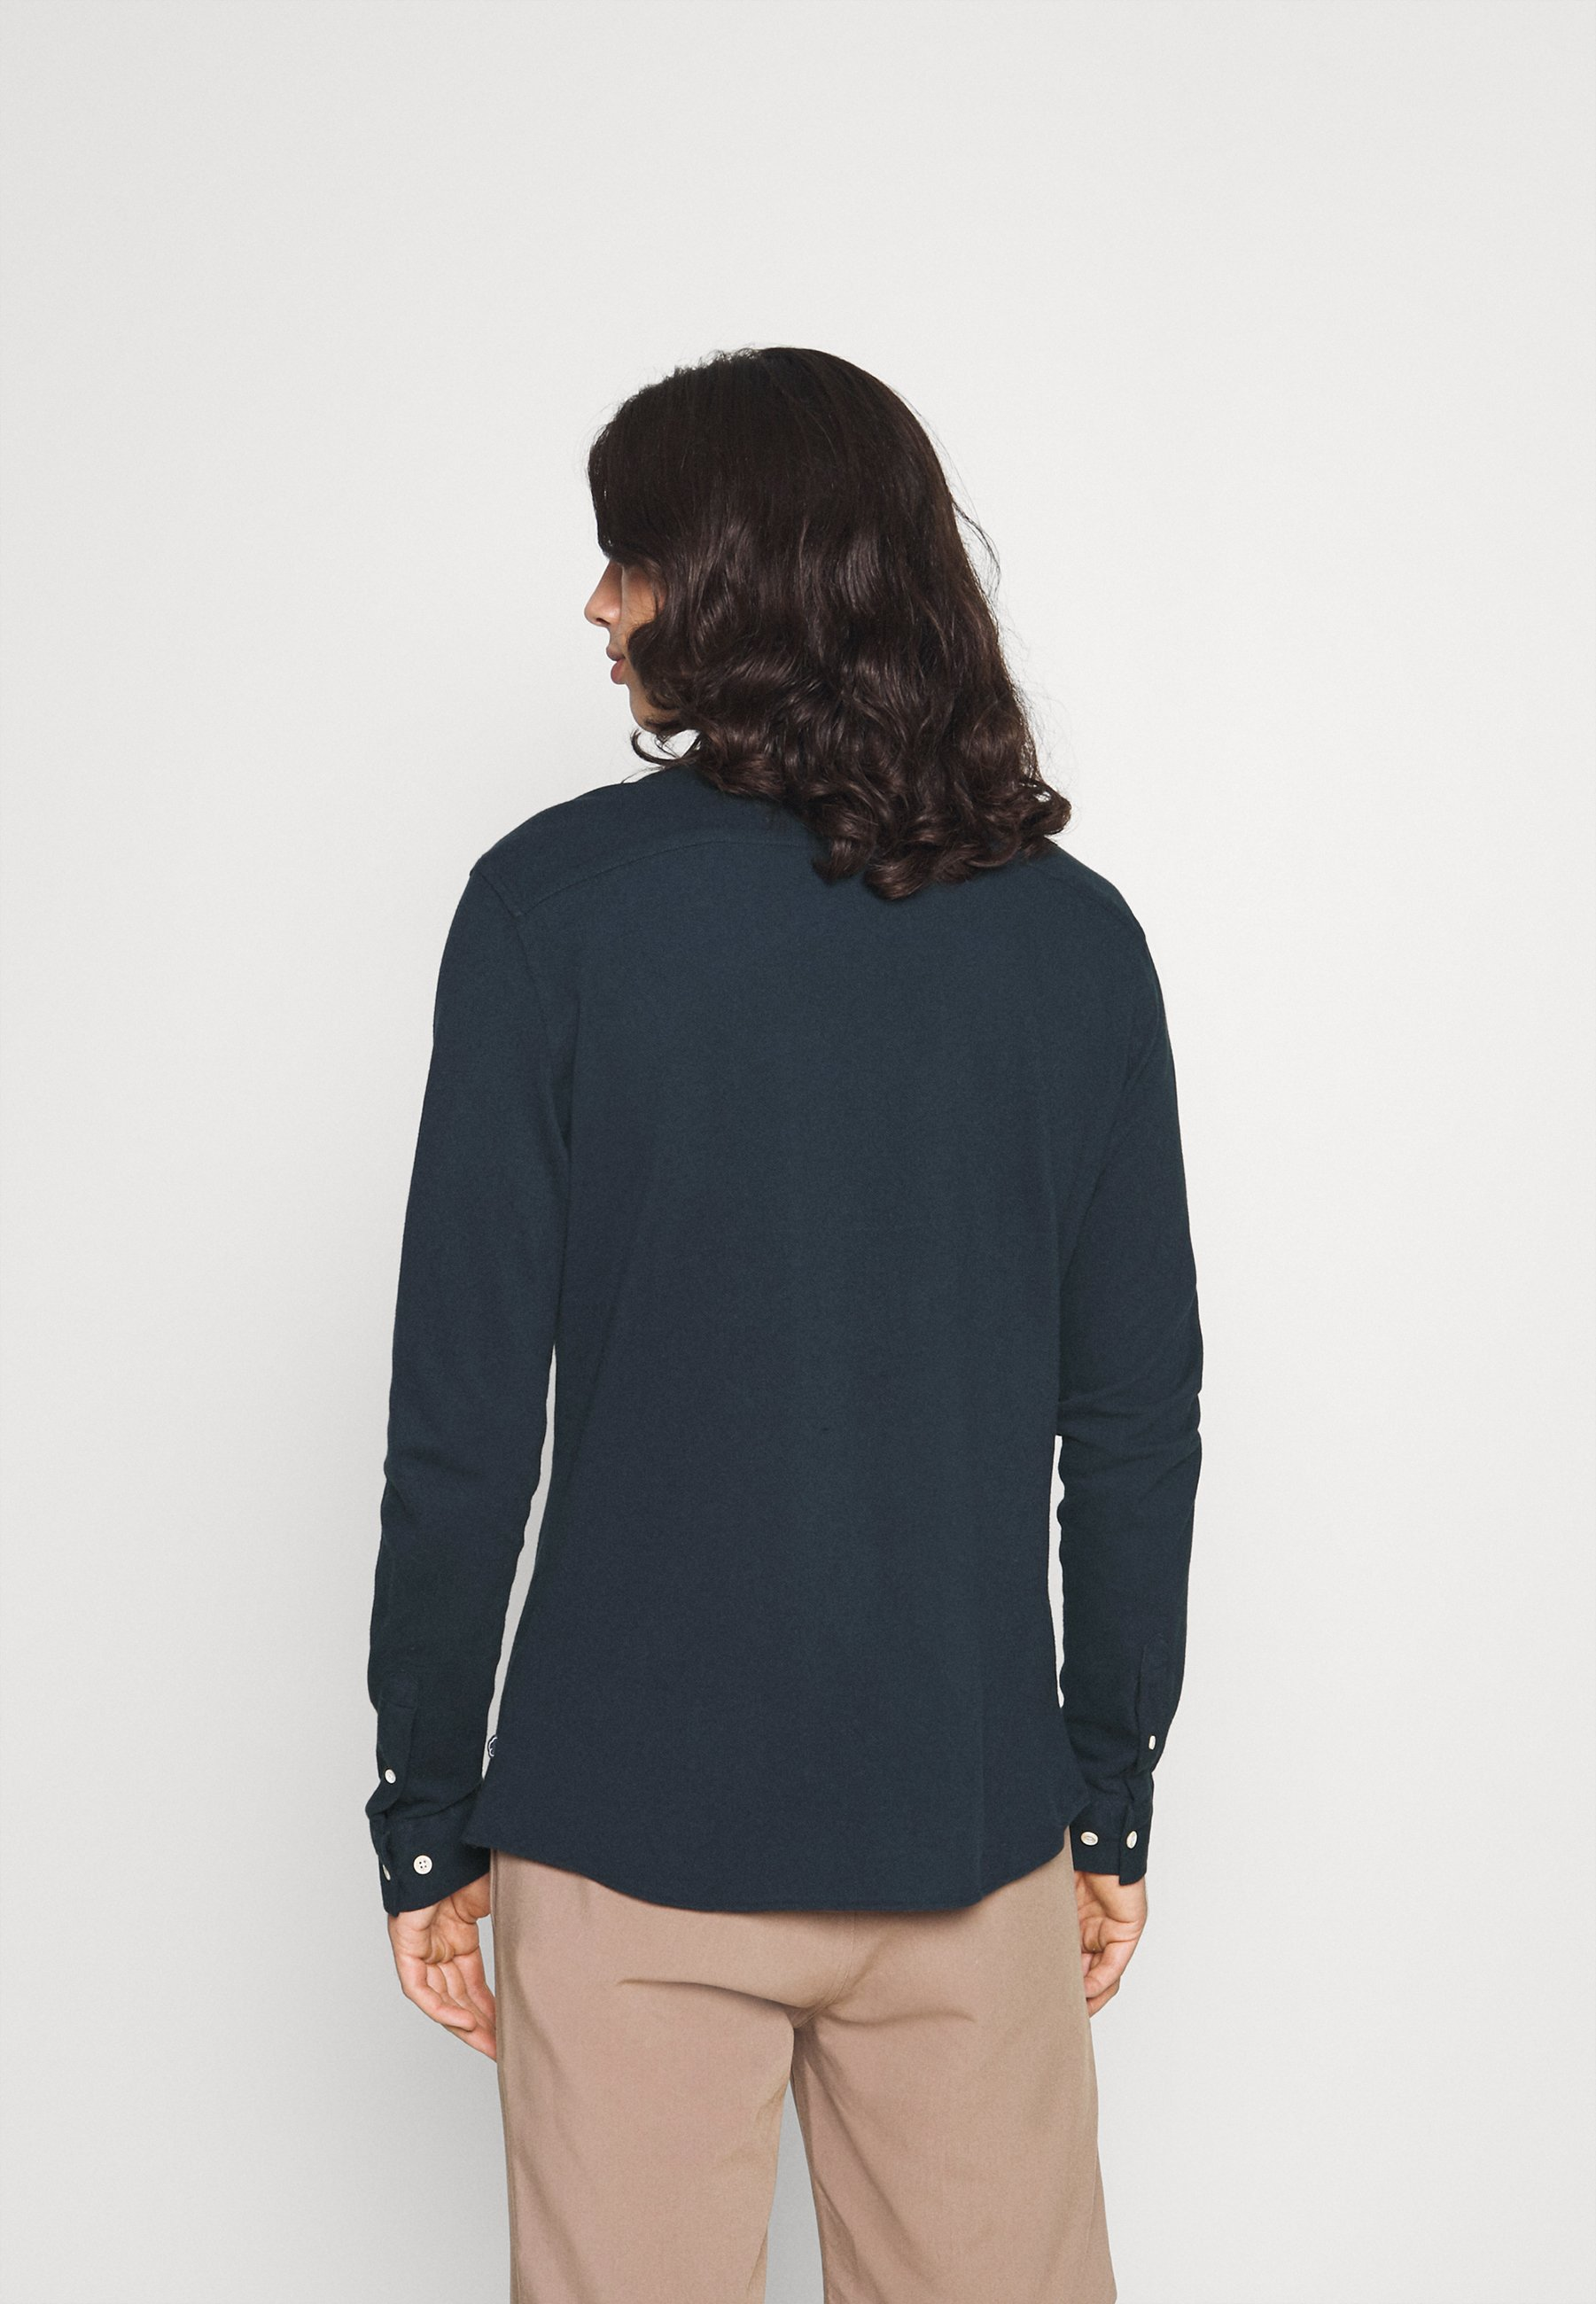 Homme STRONG - T-shirt à manches longues